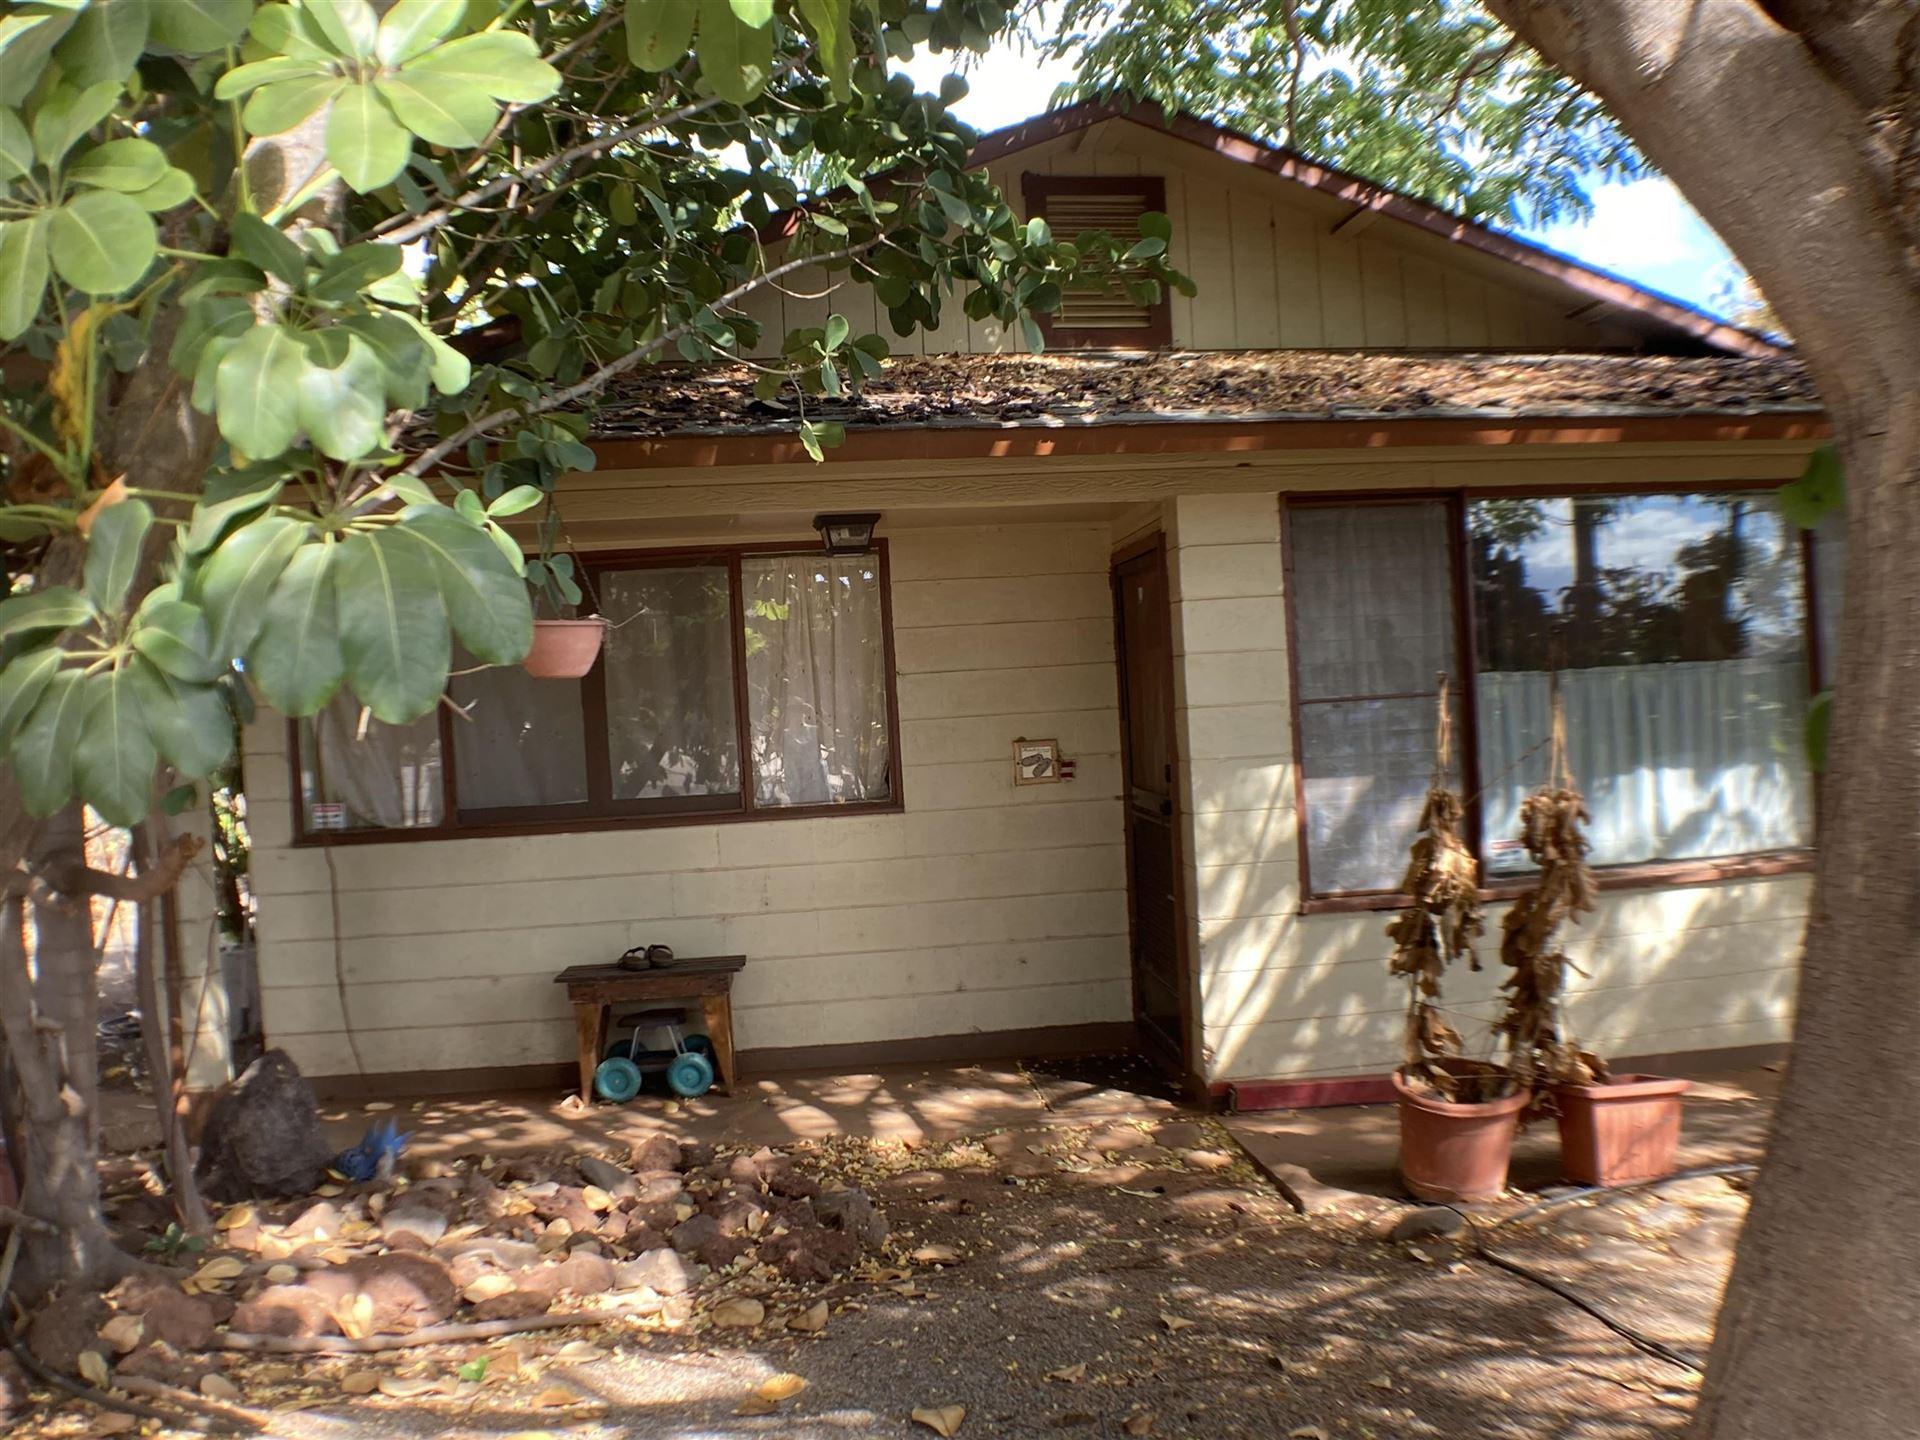 Photo of 100 Iliahi Pl, Kaunakakai, HI 96748-0000 (MLS # 392741)